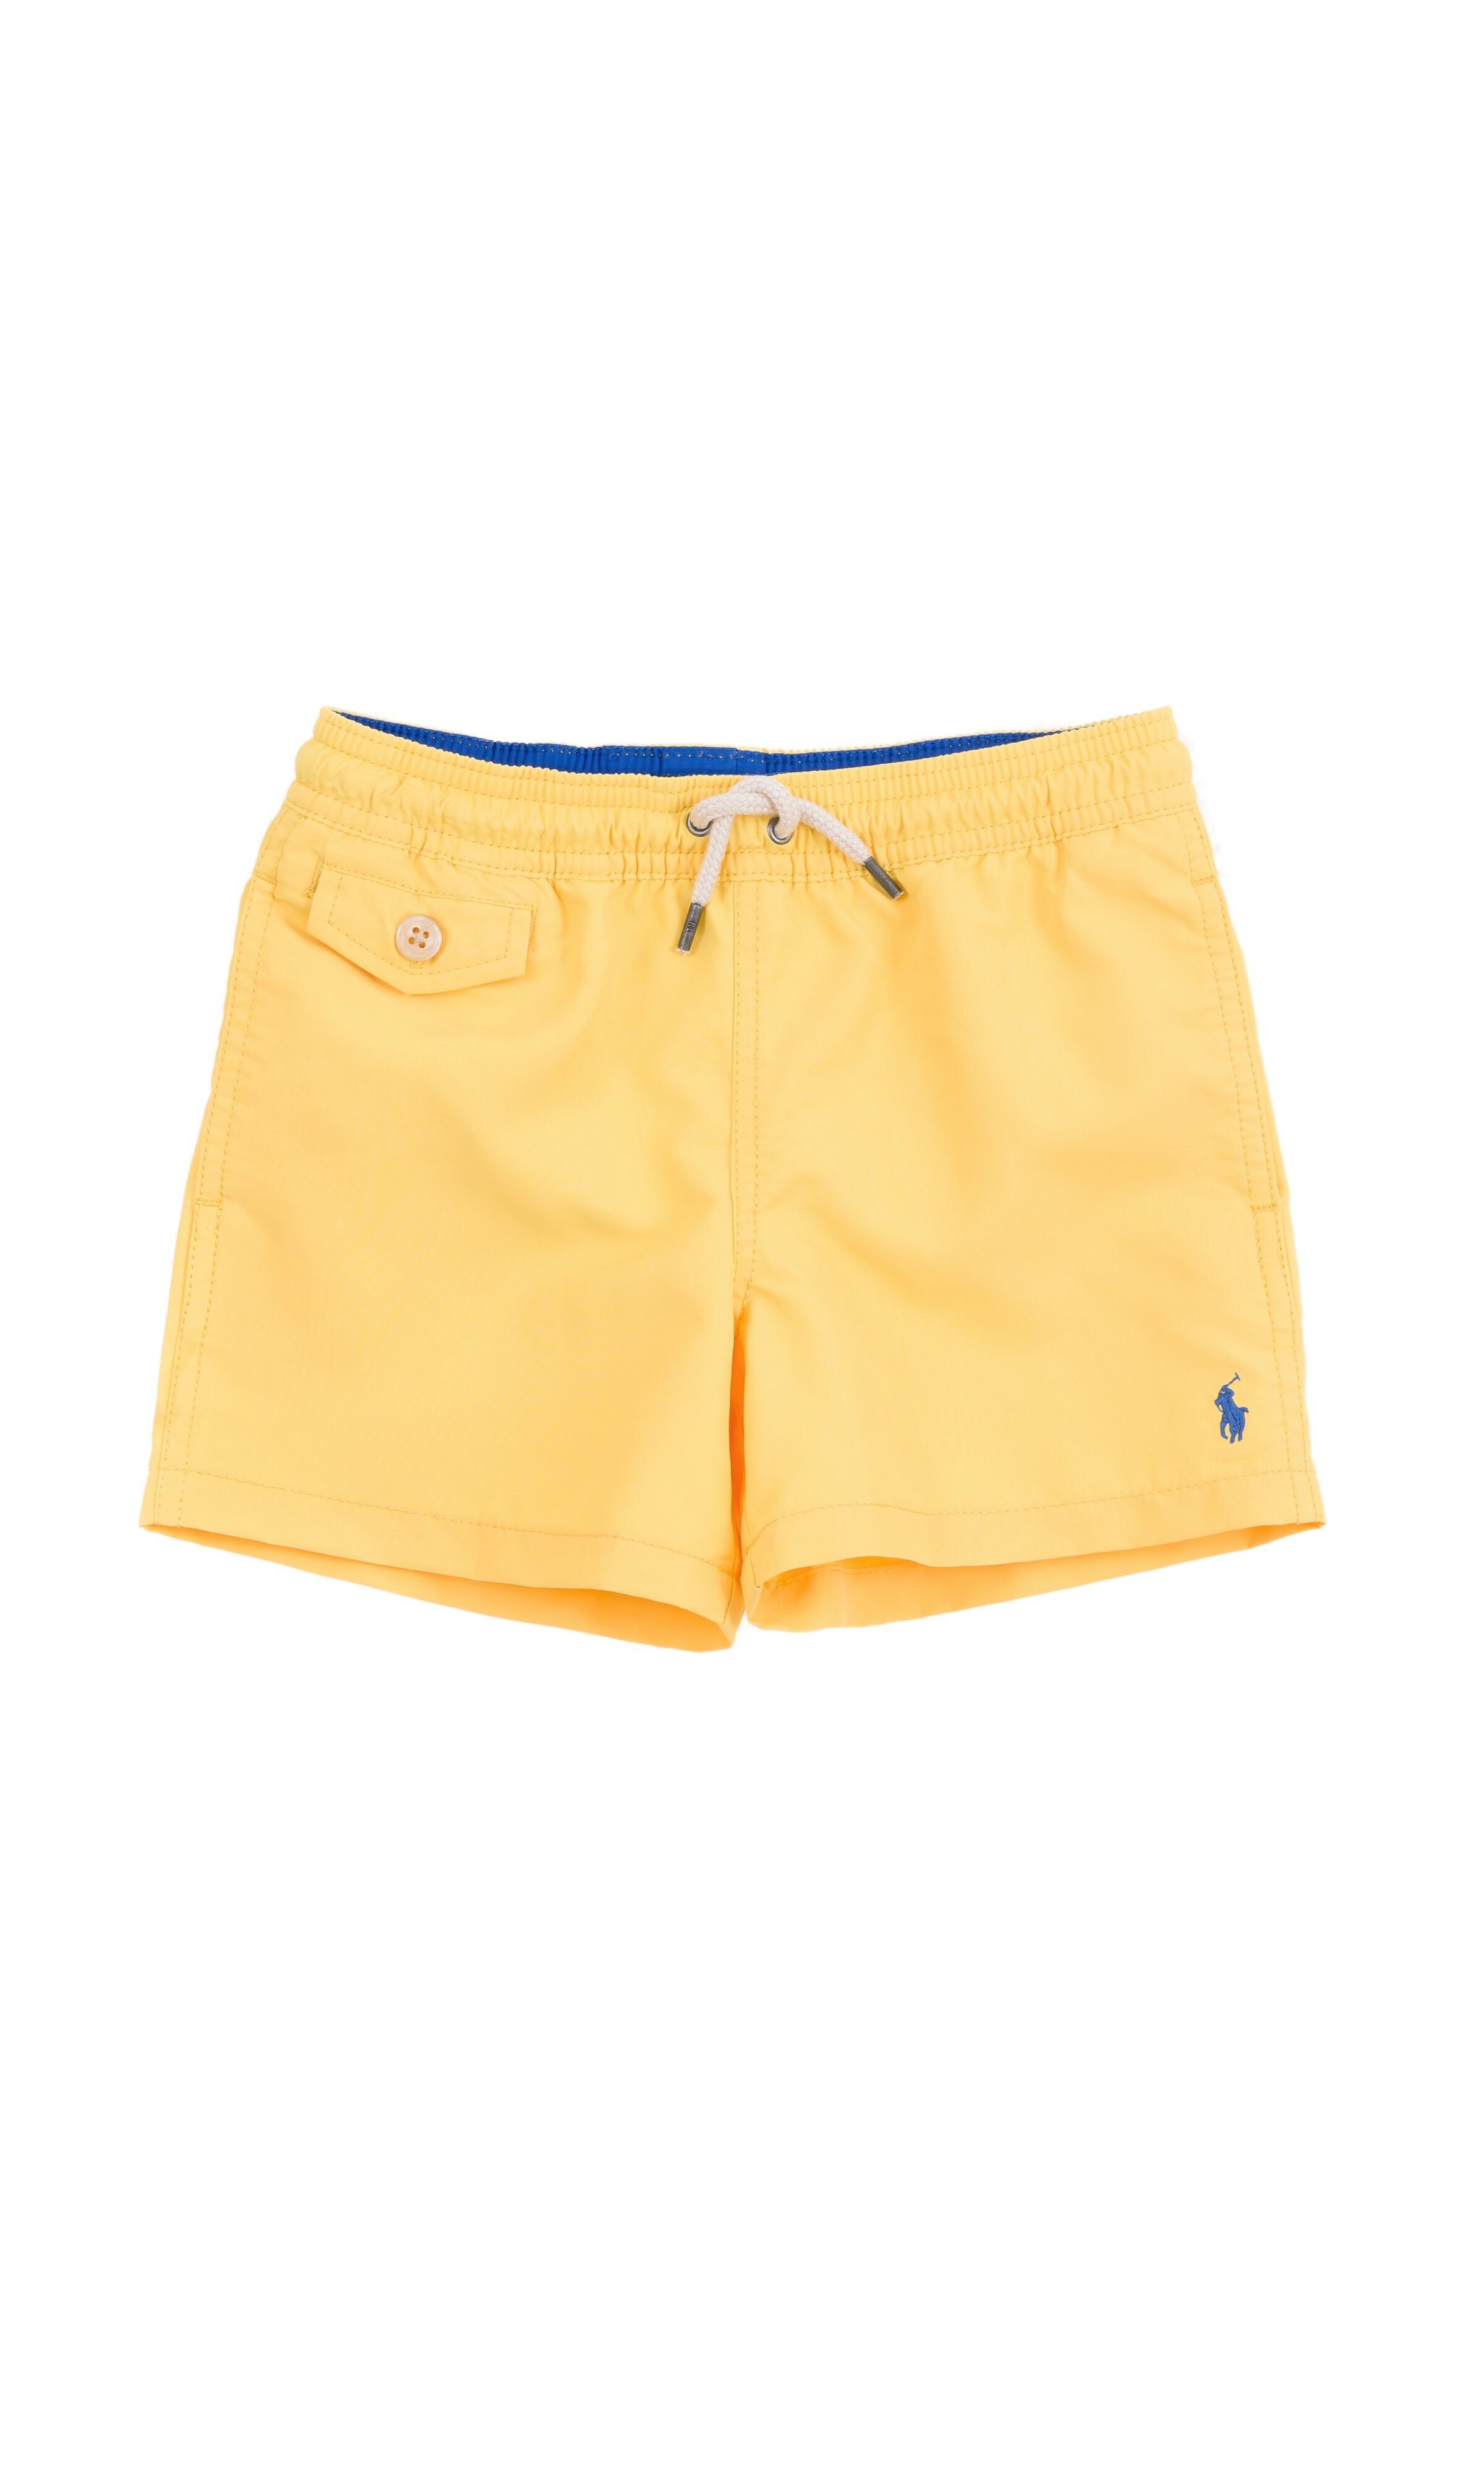 5f003510c2 Yellow boys swim shorts, Polo Ralph Lauren - Celebrity-Club